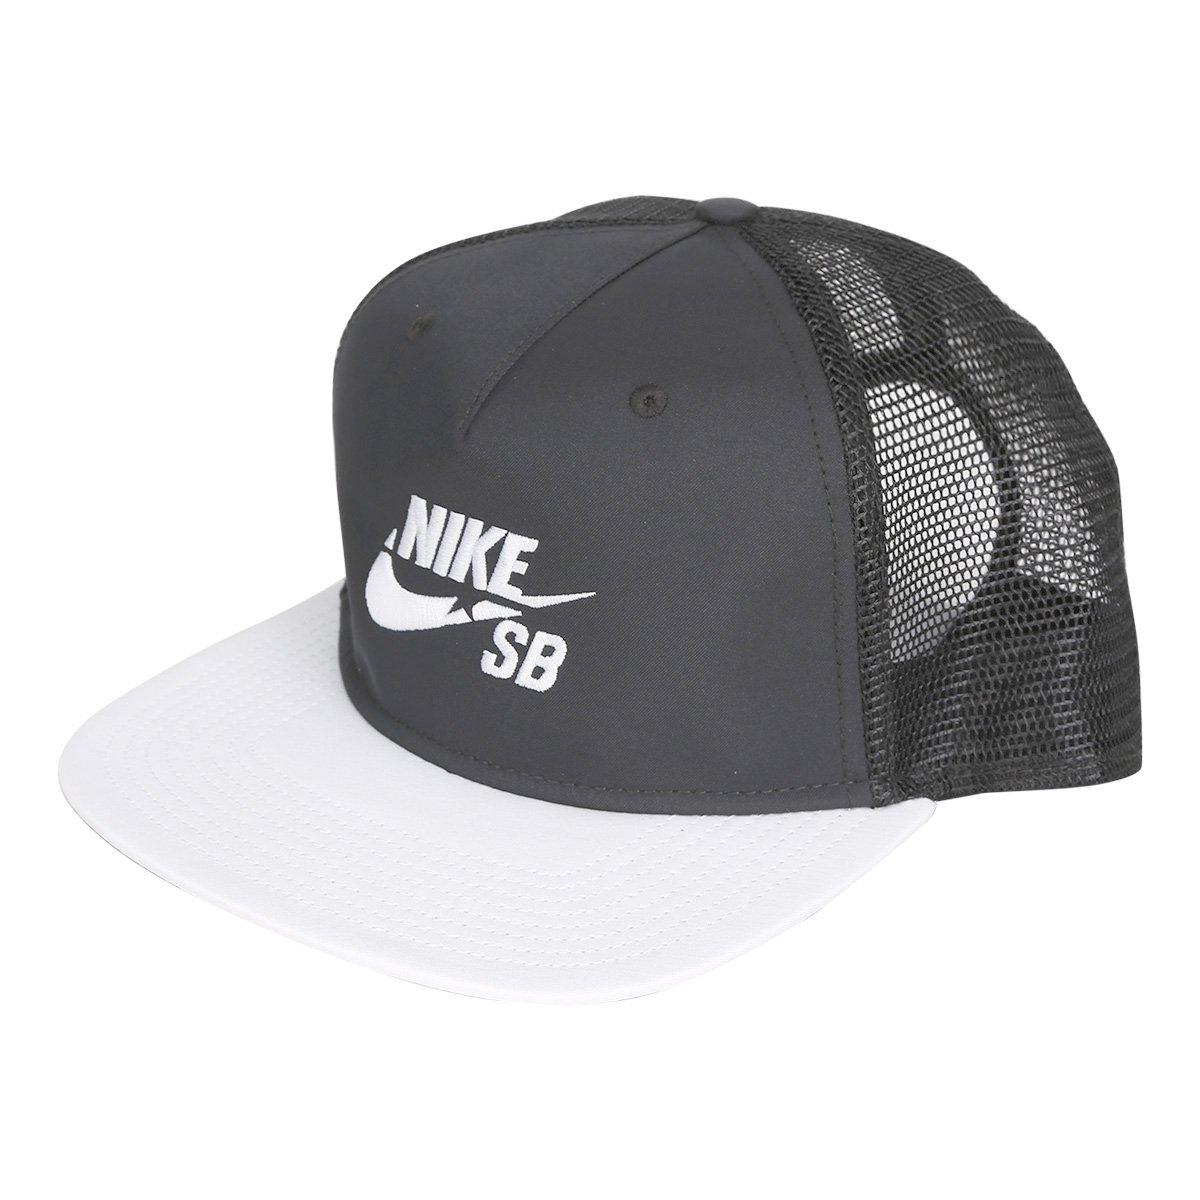 Boné Nike Cap SB Trucker - Compre Agora  235087ab53a